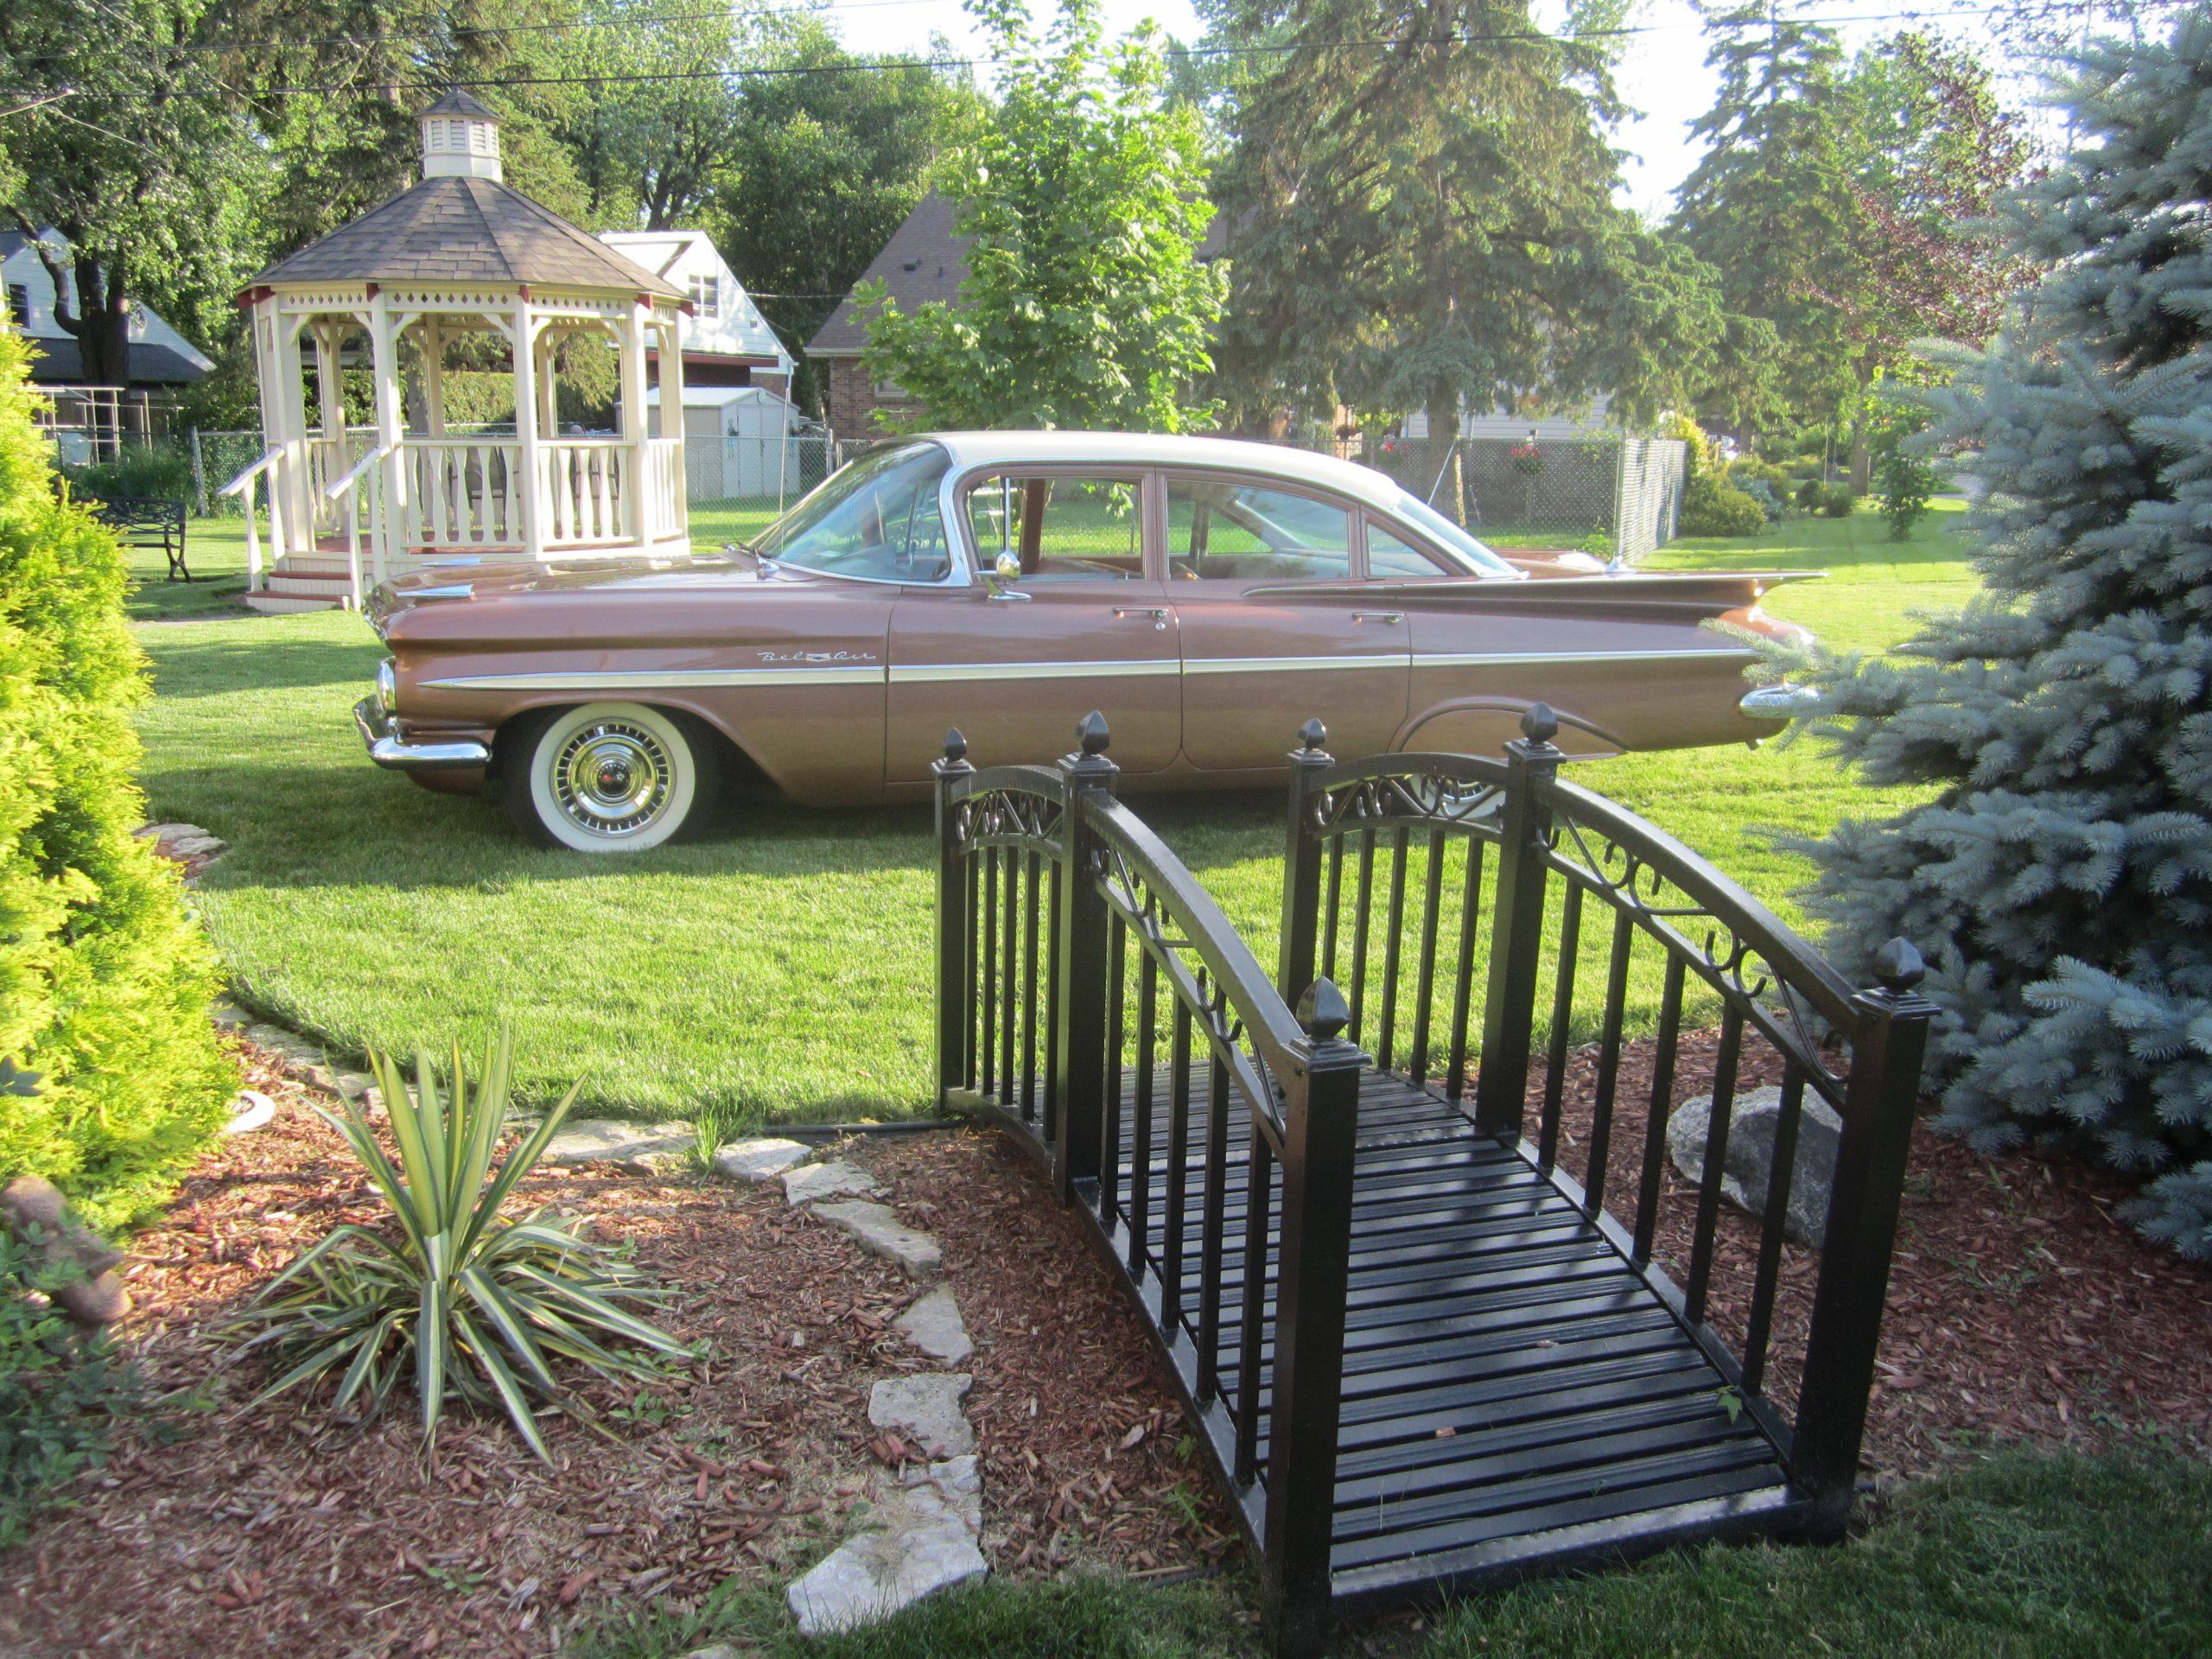 1959 Chevrolet Bel Air profile back yard